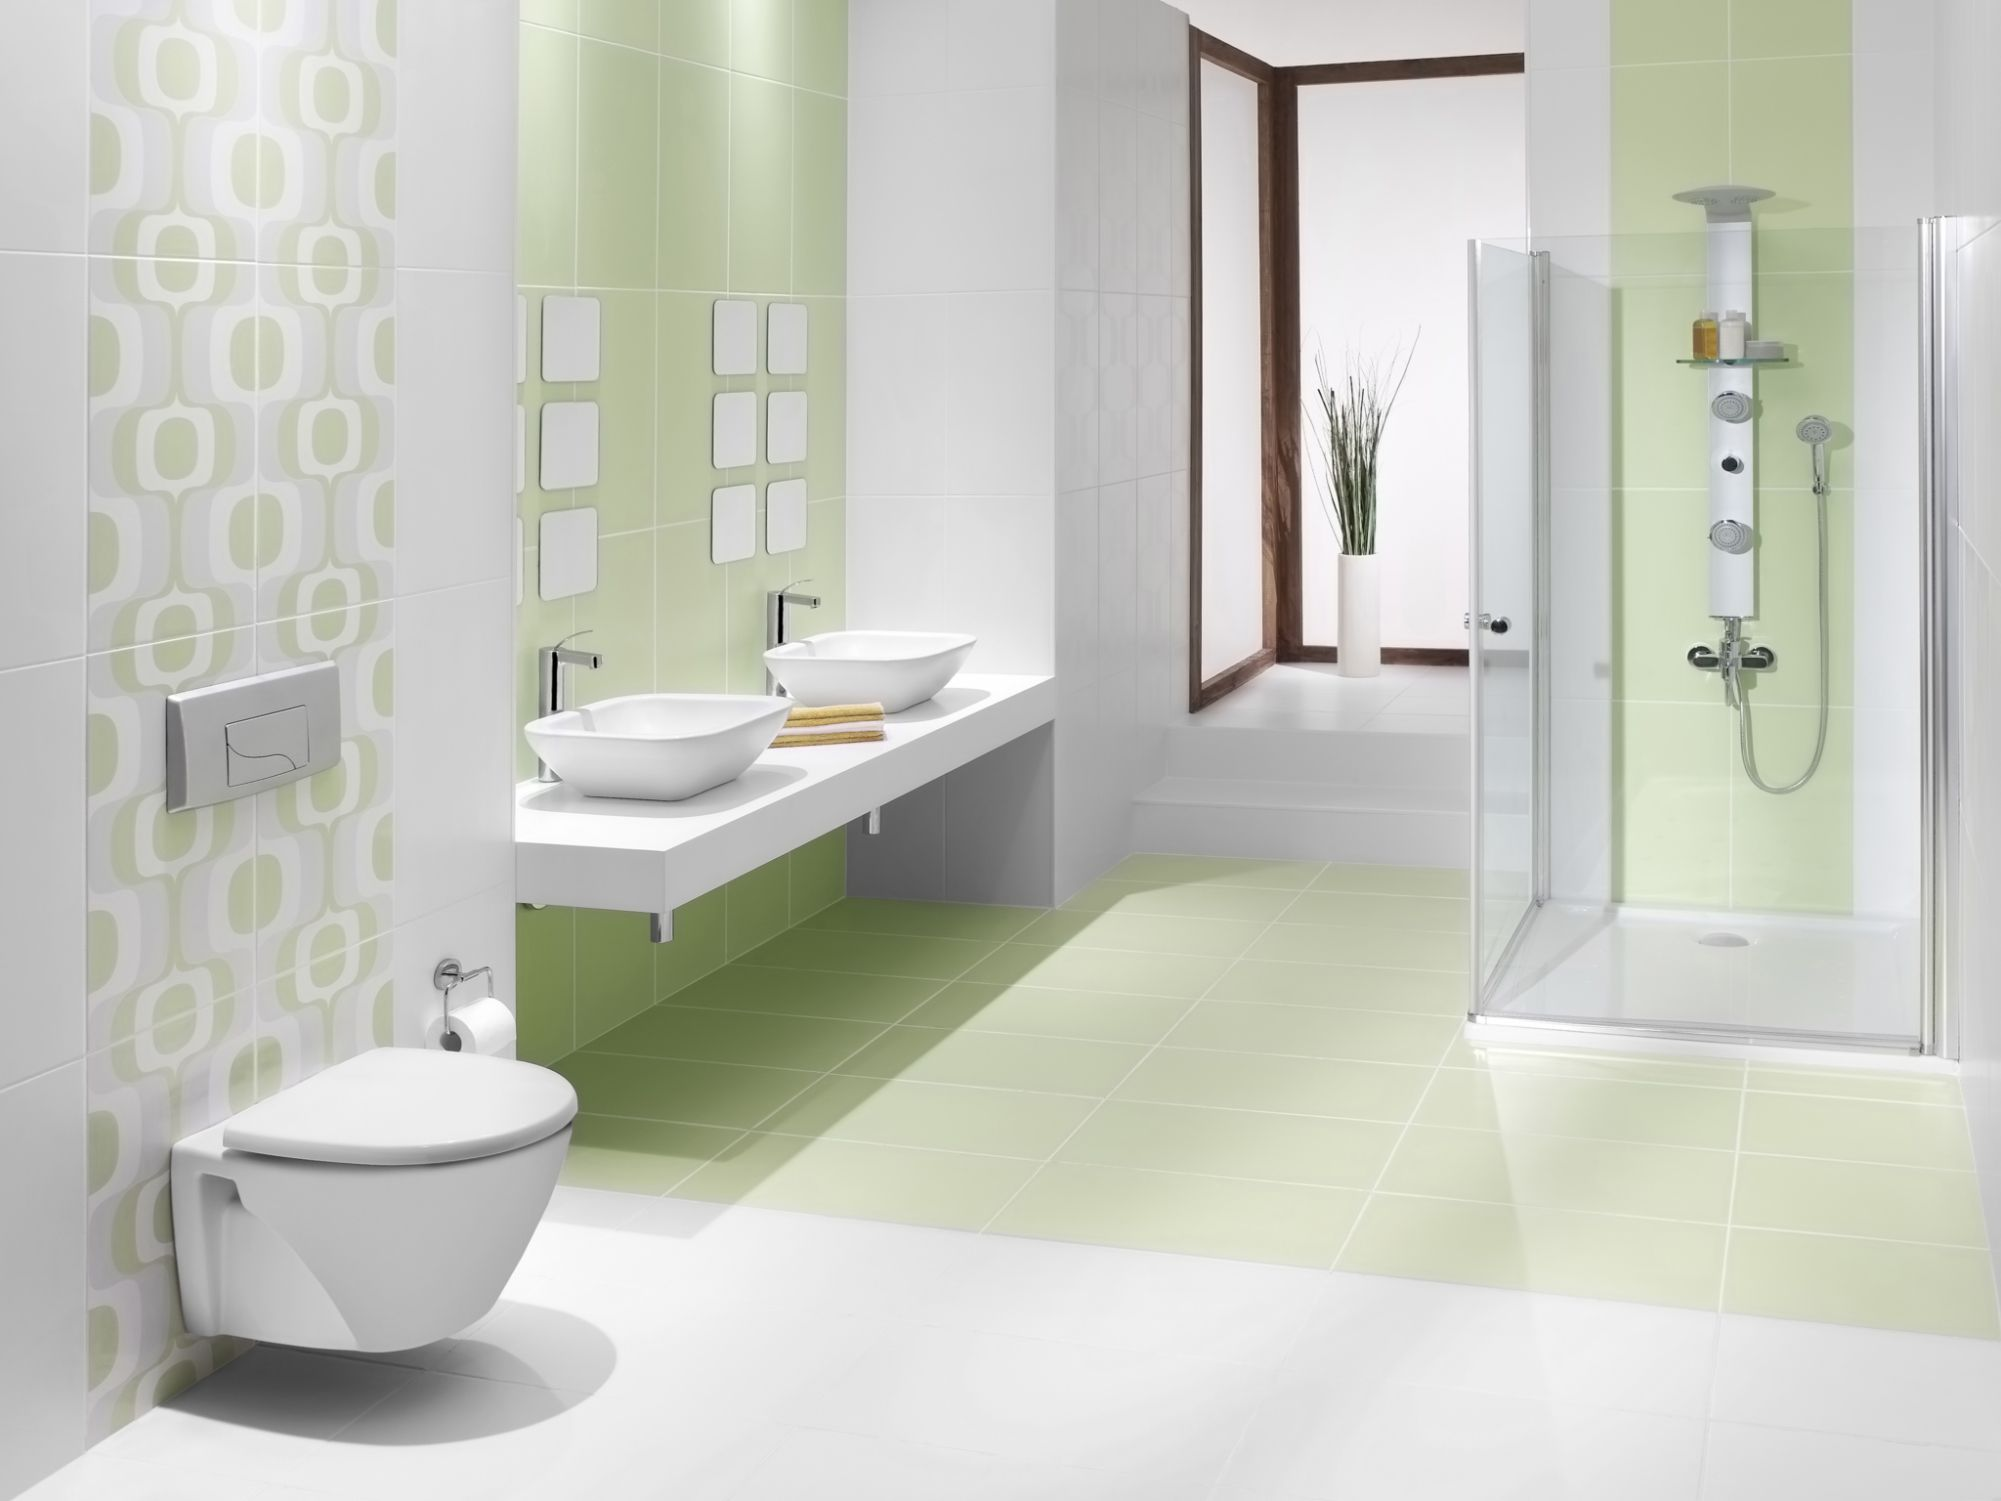 Green tiles for bathroom - Green Tiles For Bathroom 10